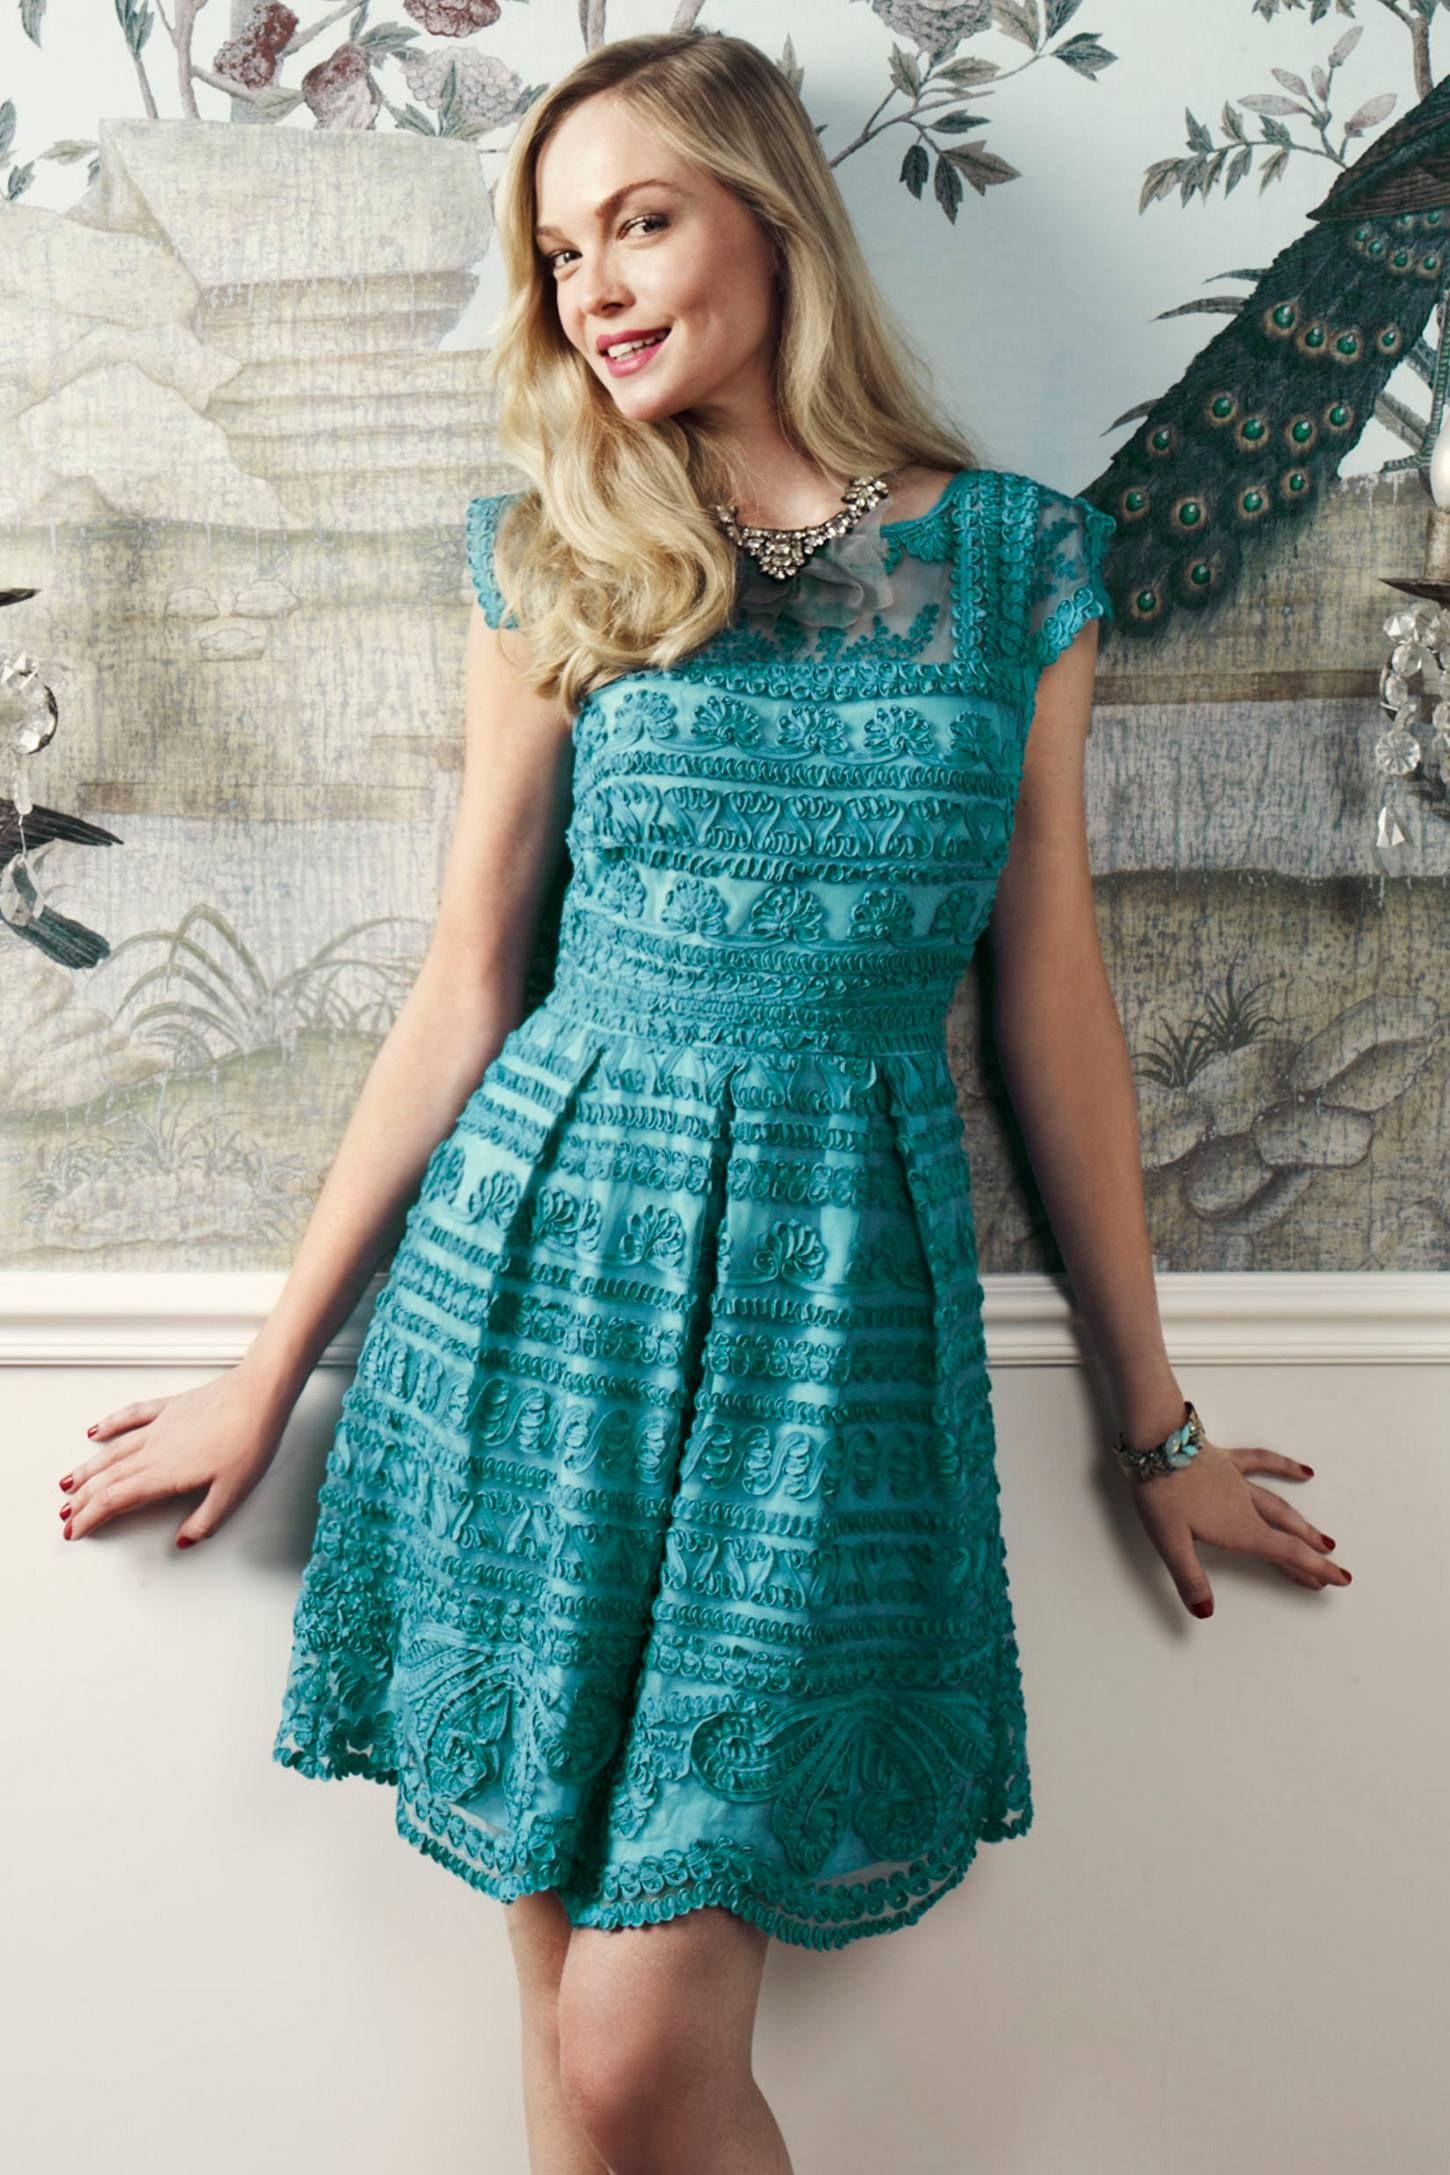 Cute Bridesmaid Dress! New Light Dress - anthropologie.com | Wedding ...